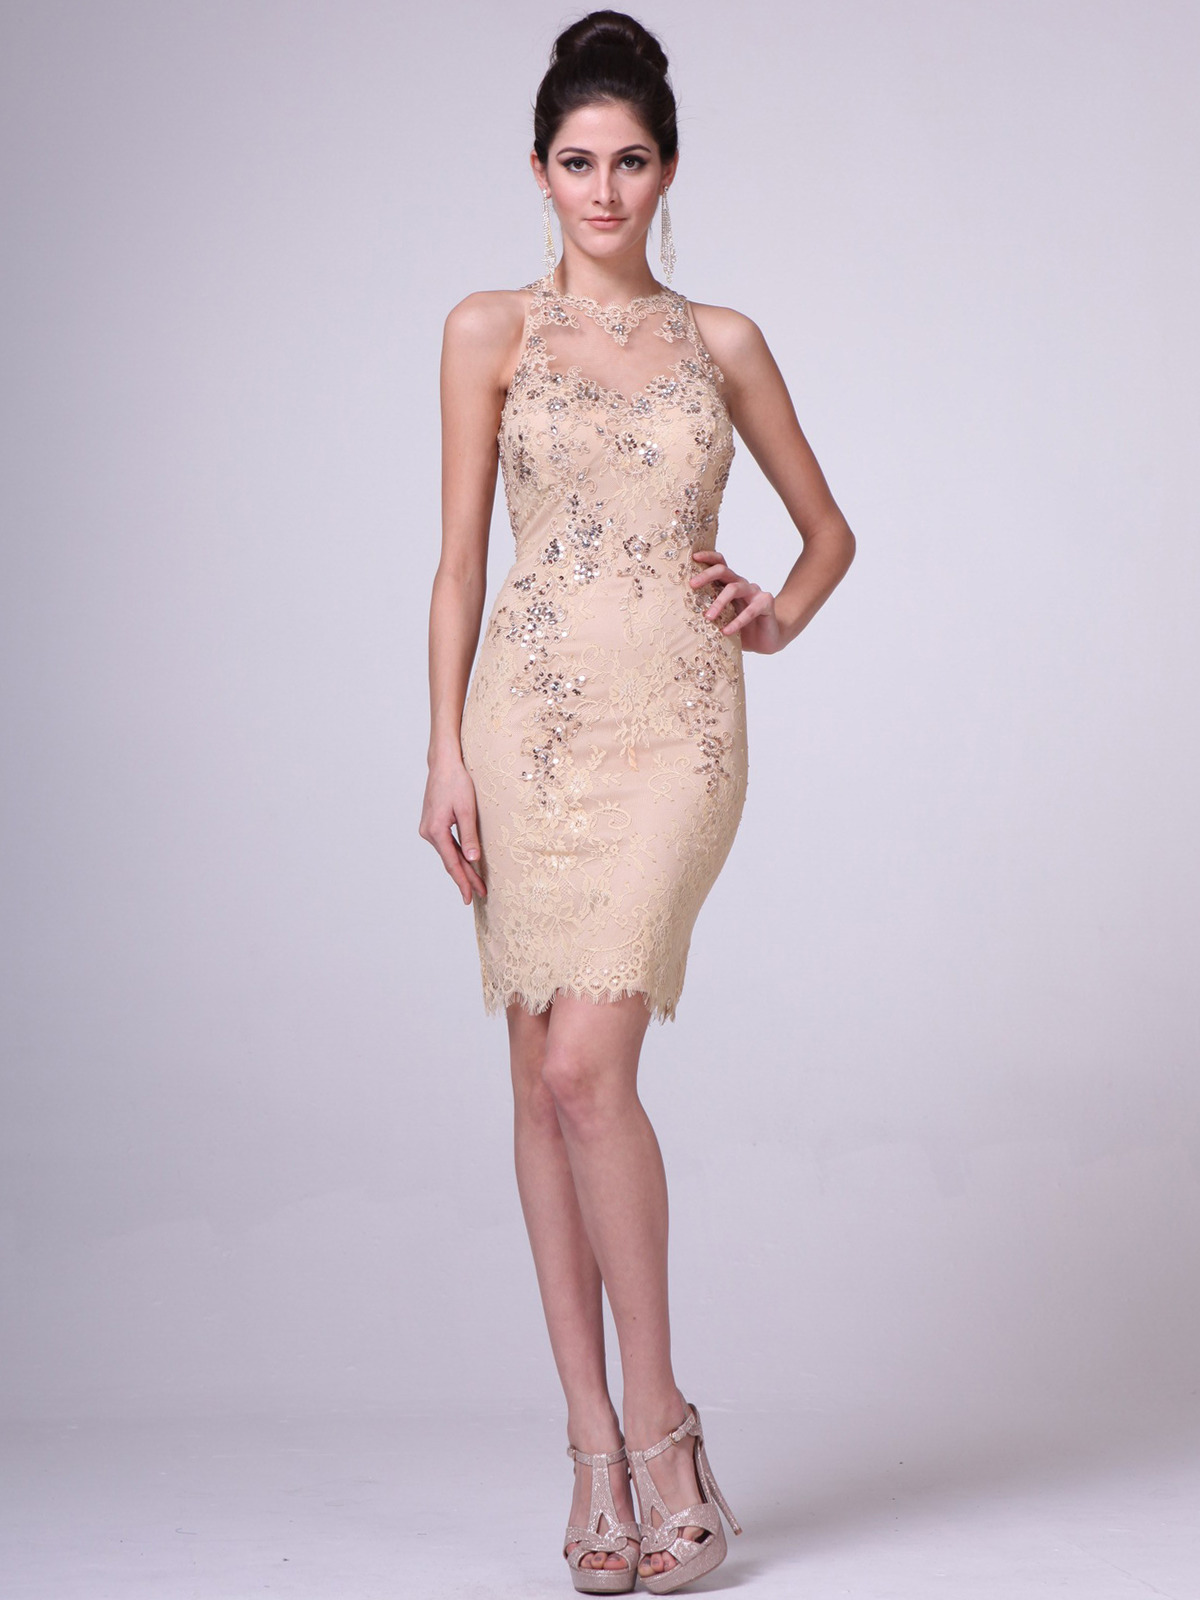 Illusion Yoke Embroidery Sheath Dress | Sung Boutique L.A.